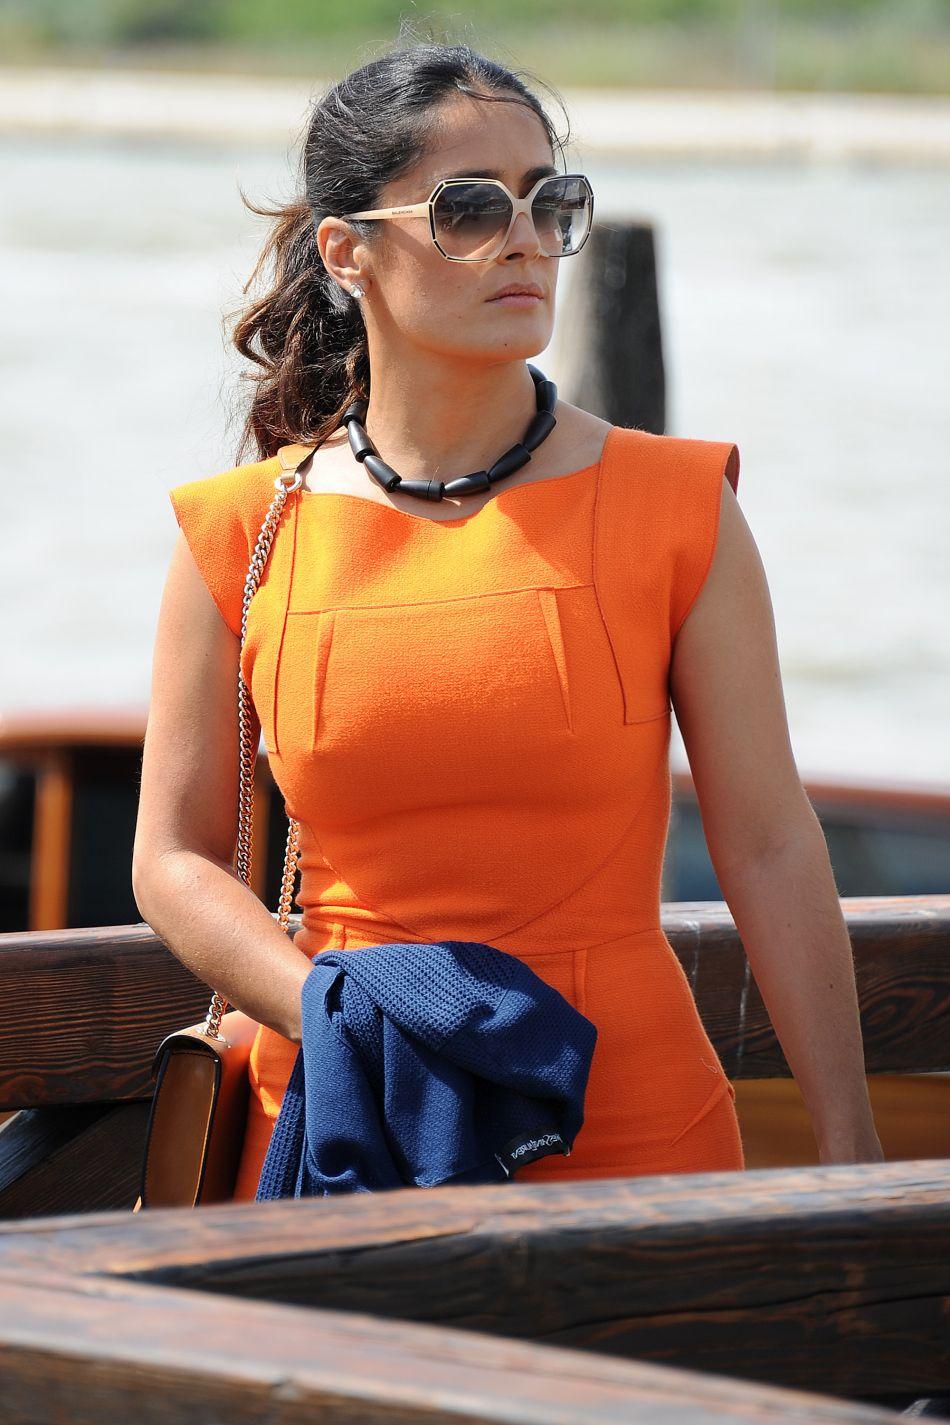 salma hayek in orange dress with her former husband and